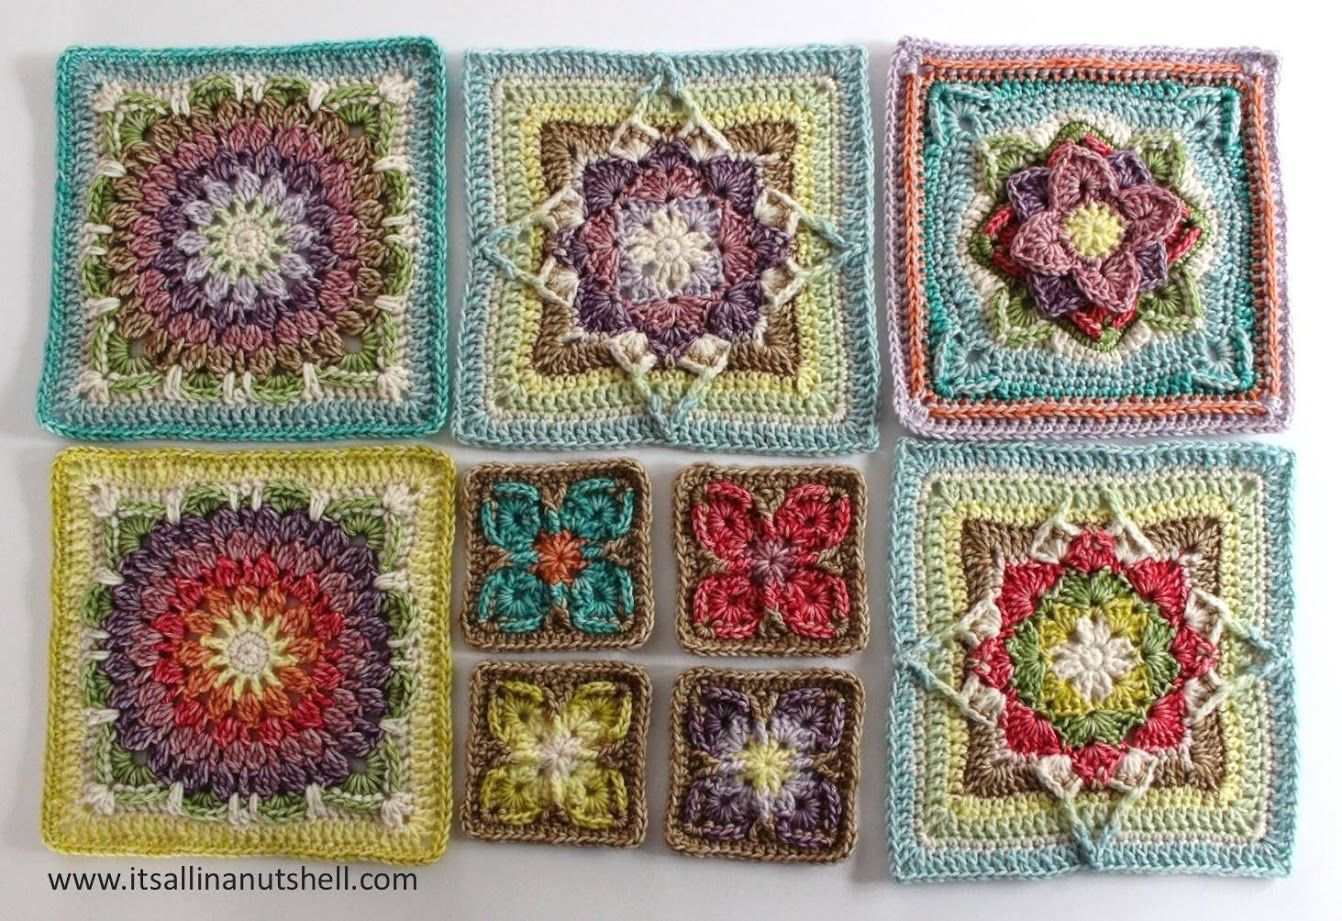 demelza blanket | 1 пледы подушки коврики | Pinterest